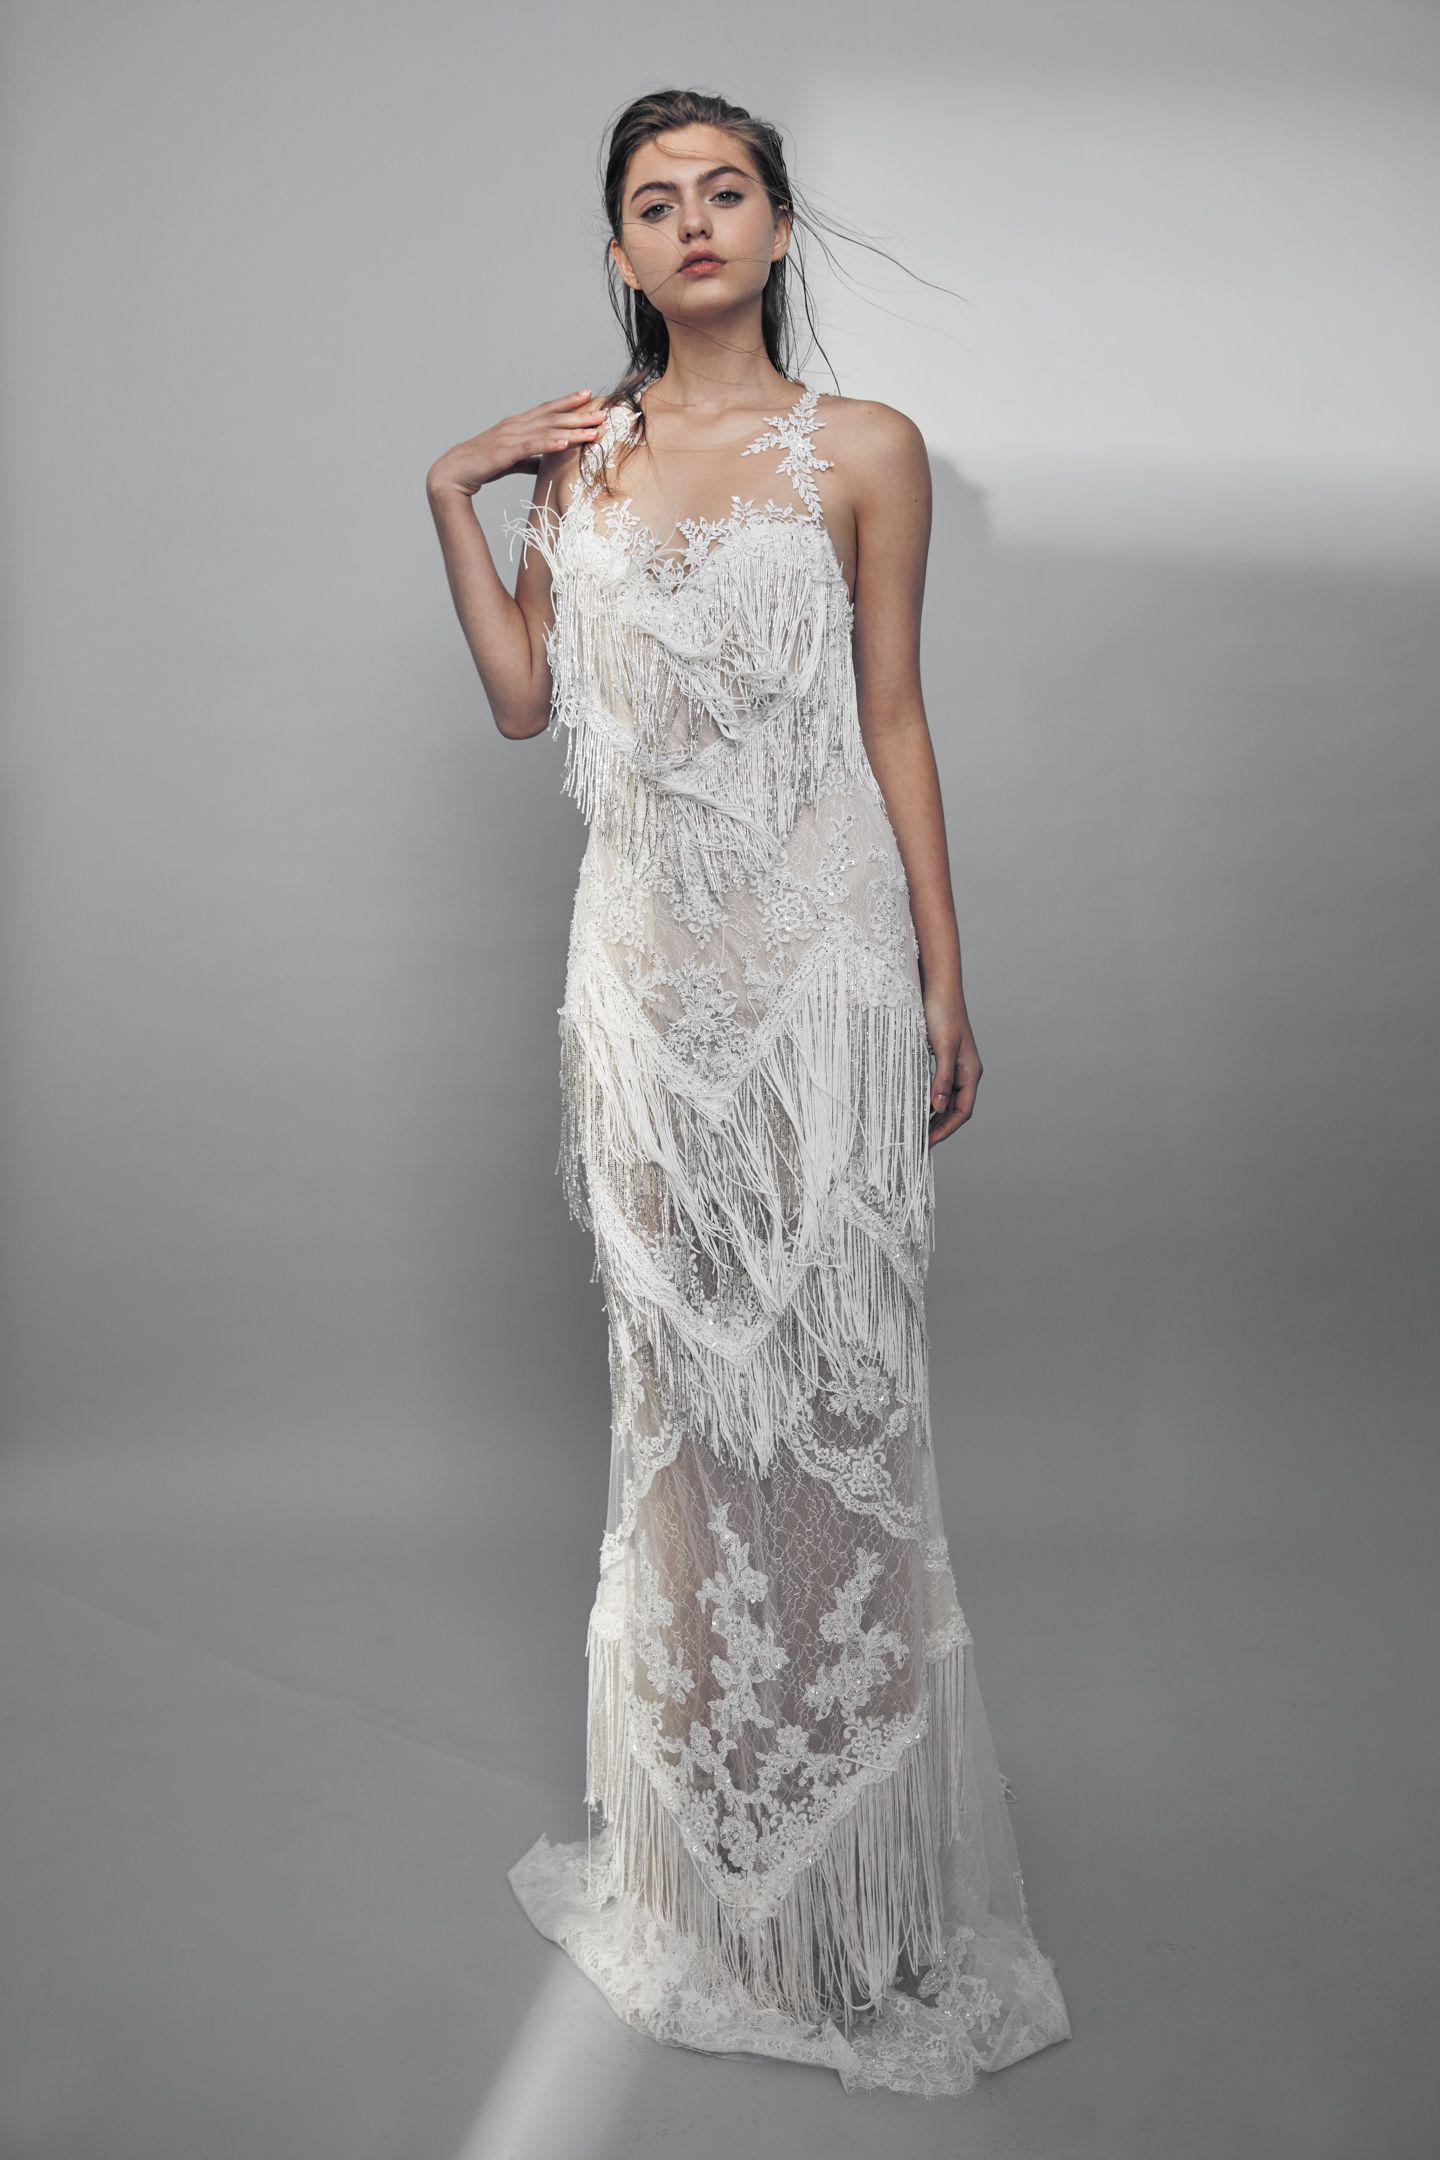 LinLi Boutique,林莉婚紗,白紗,新娘禮服,結婚禮服,婚紗